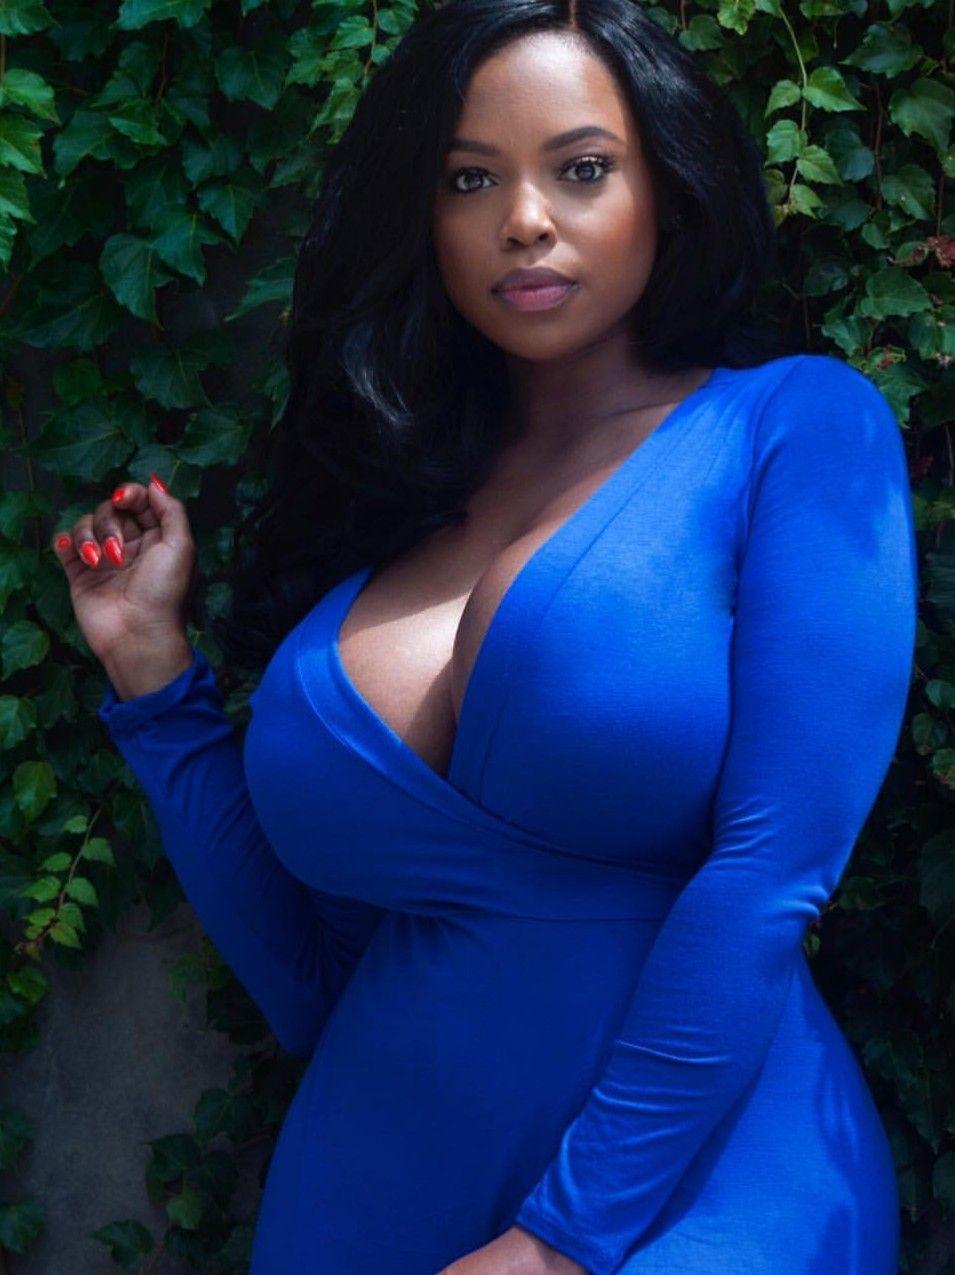 Big breast women ebony